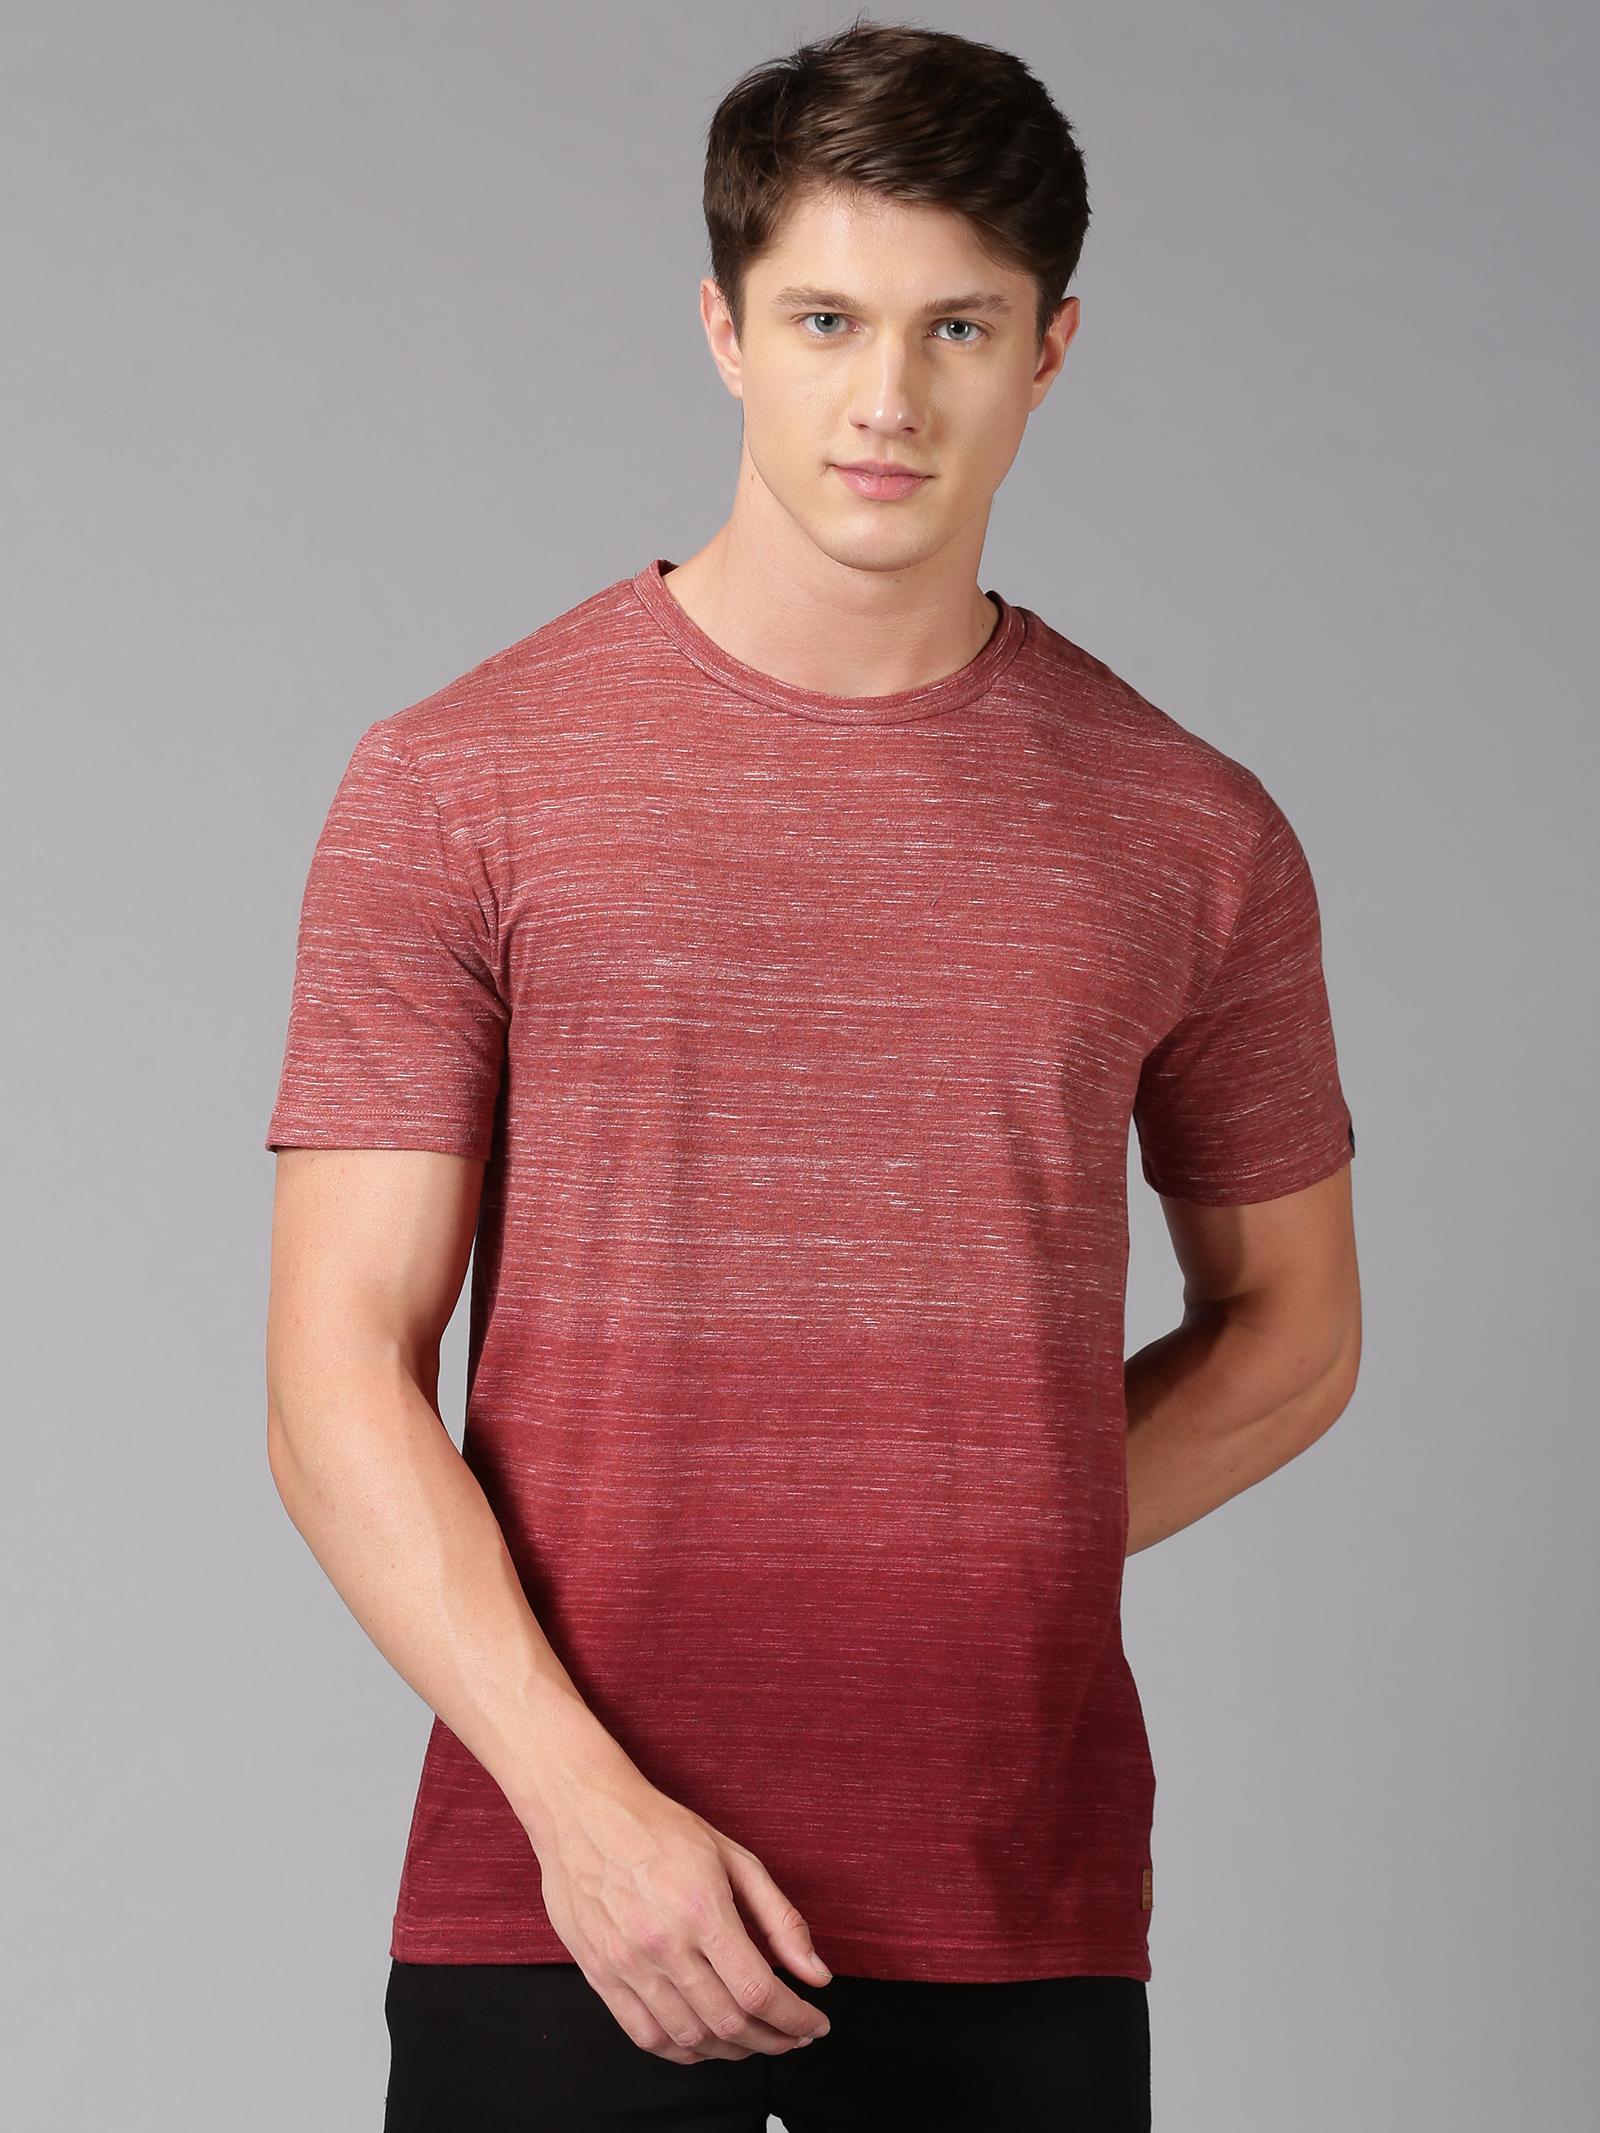 UrGear | UrGear Striped Men Round Neck Maroon T-Shirt